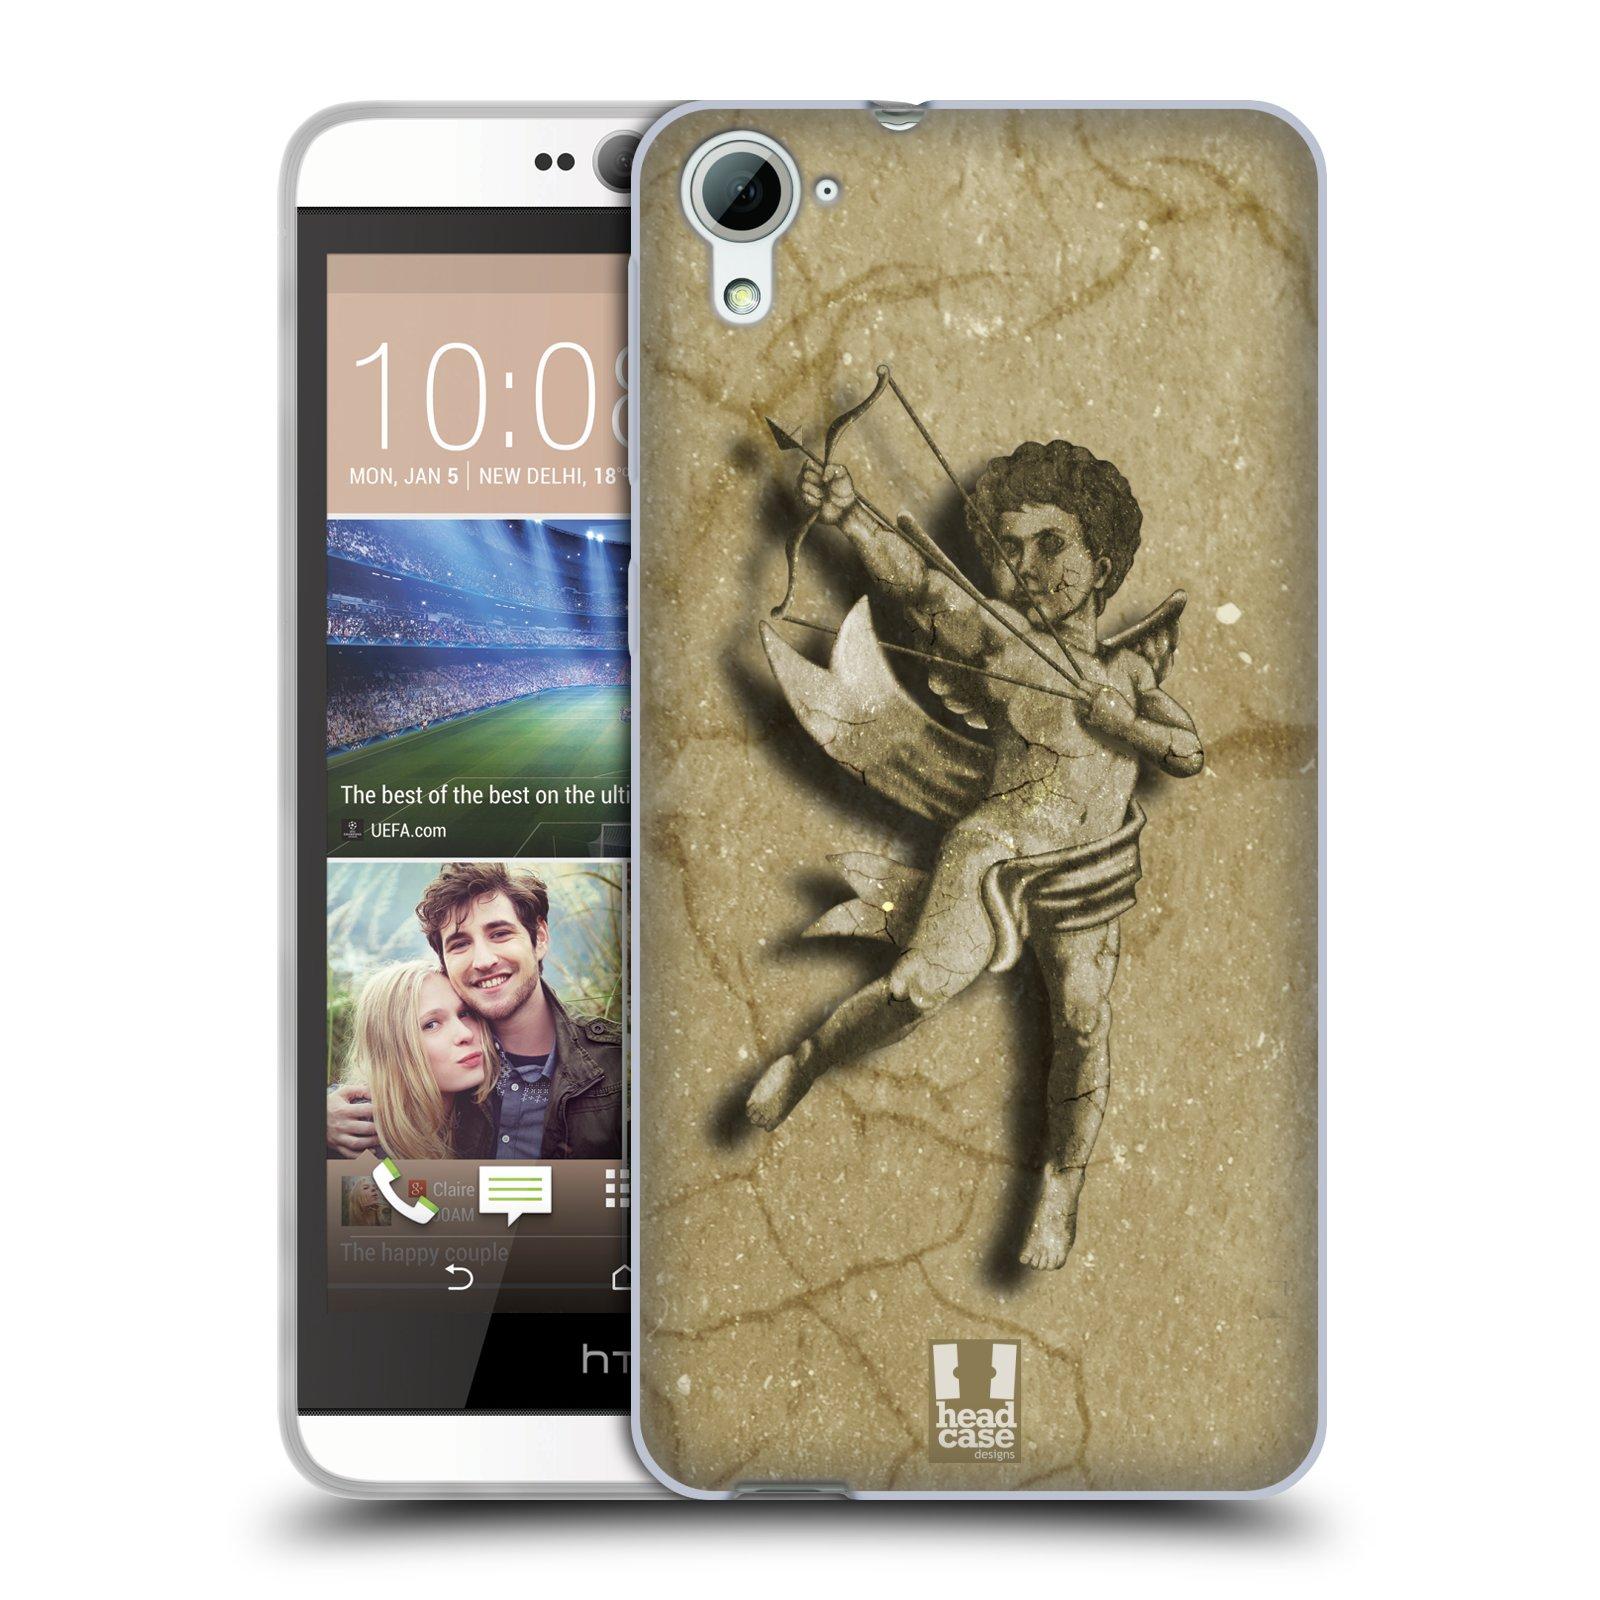 HEAD CASE silikonový obal na mobil HTC DESIRE 826 vzor Andělé z kamene LANCELOT